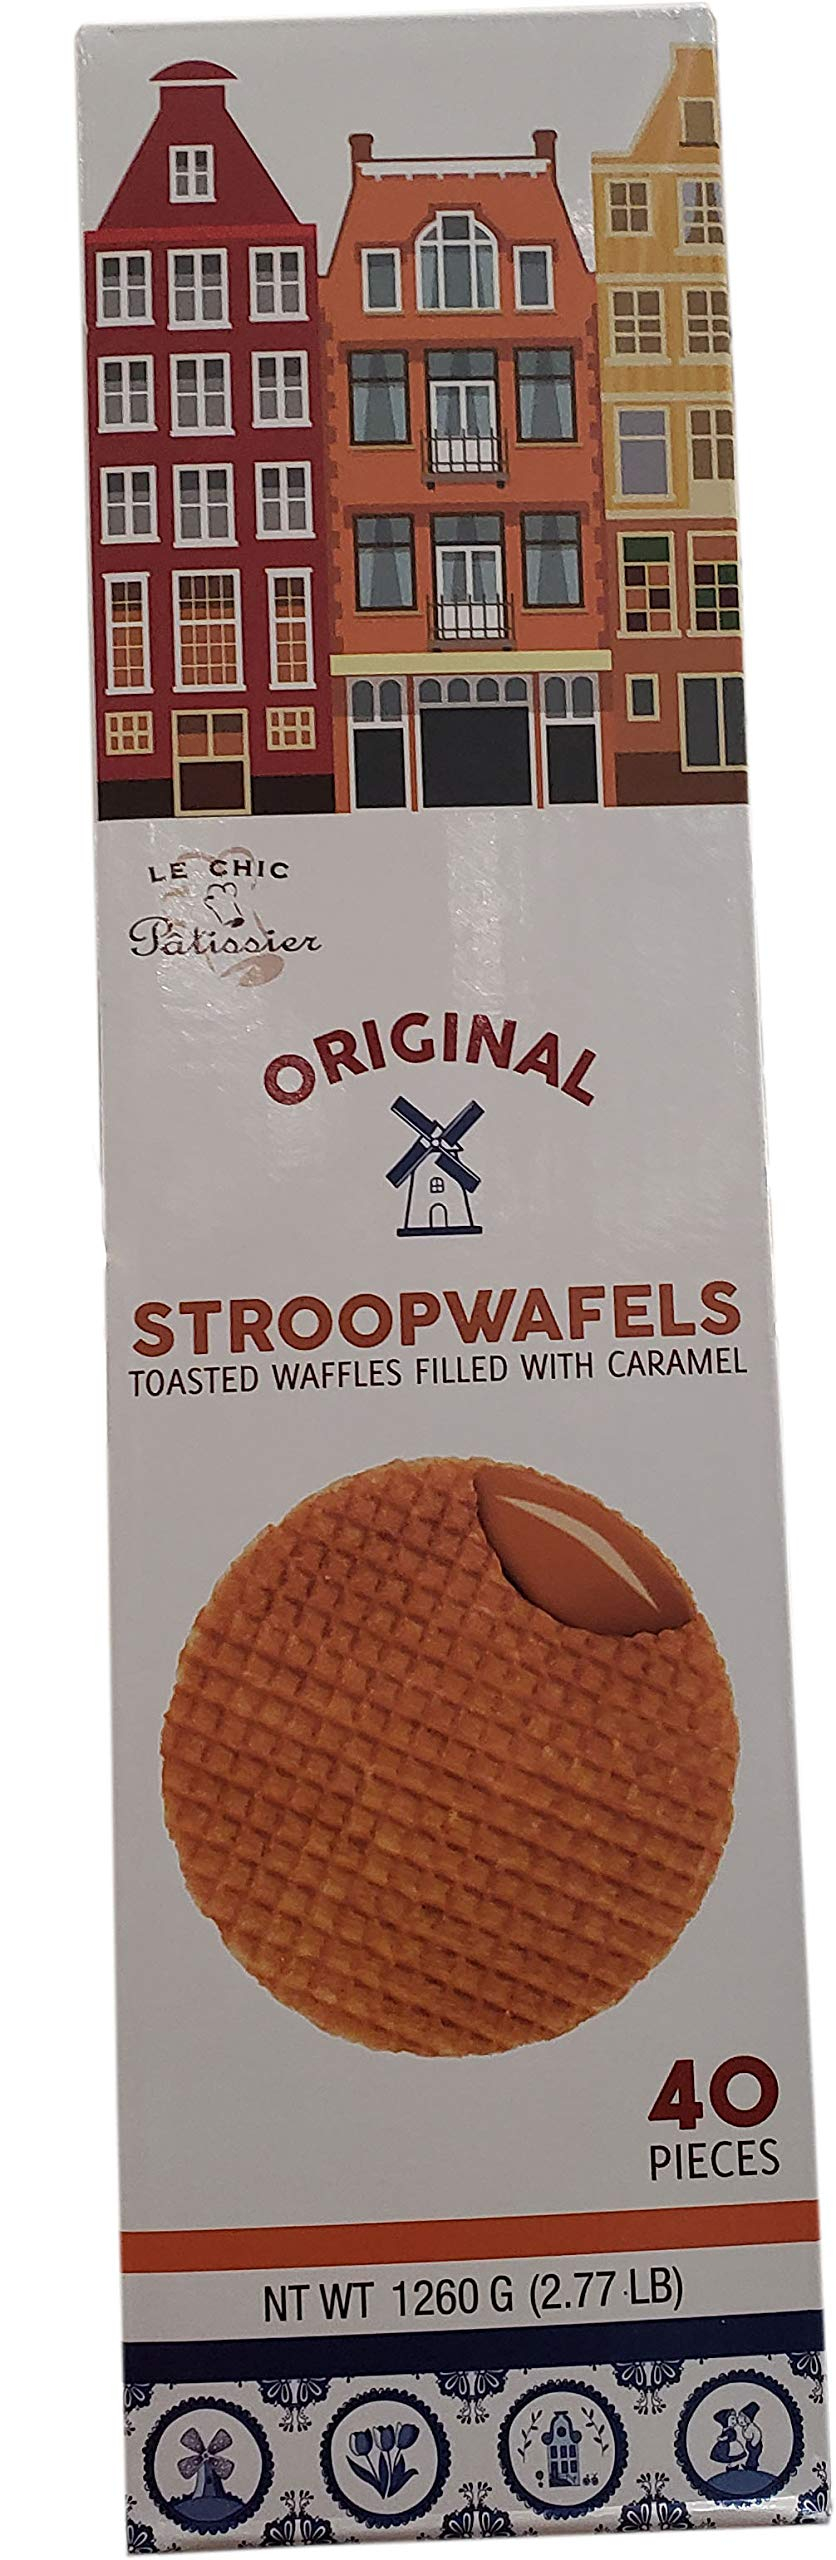 Le Chef Caramel Stroopwafel, 42.4 oz (COST1253037)